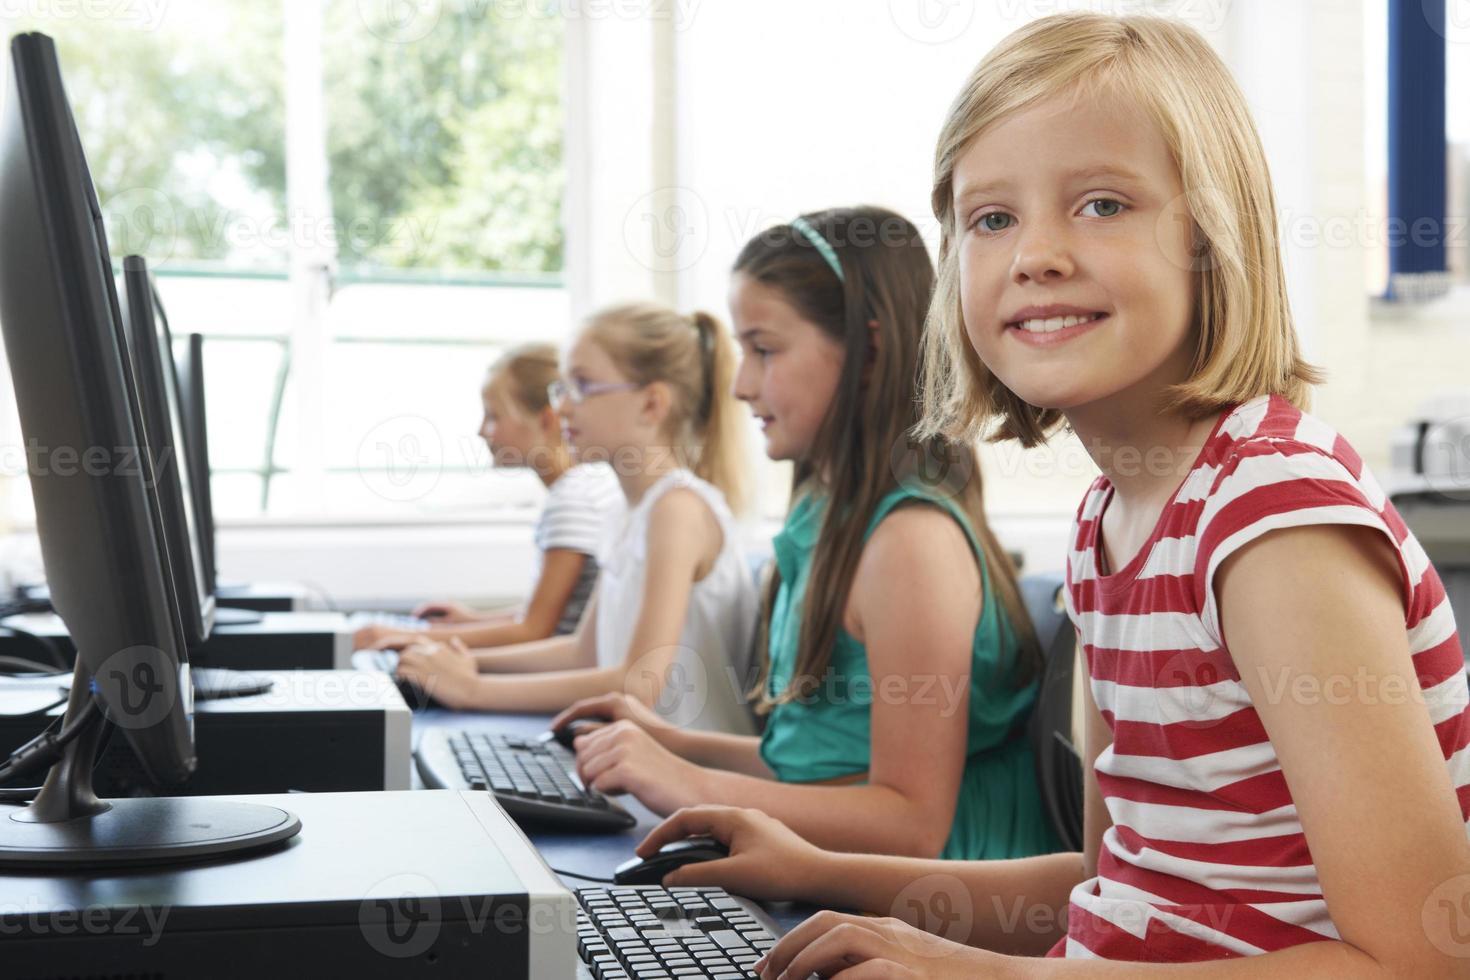 grupp kvinnliga grundskolebarn i datorklass foto